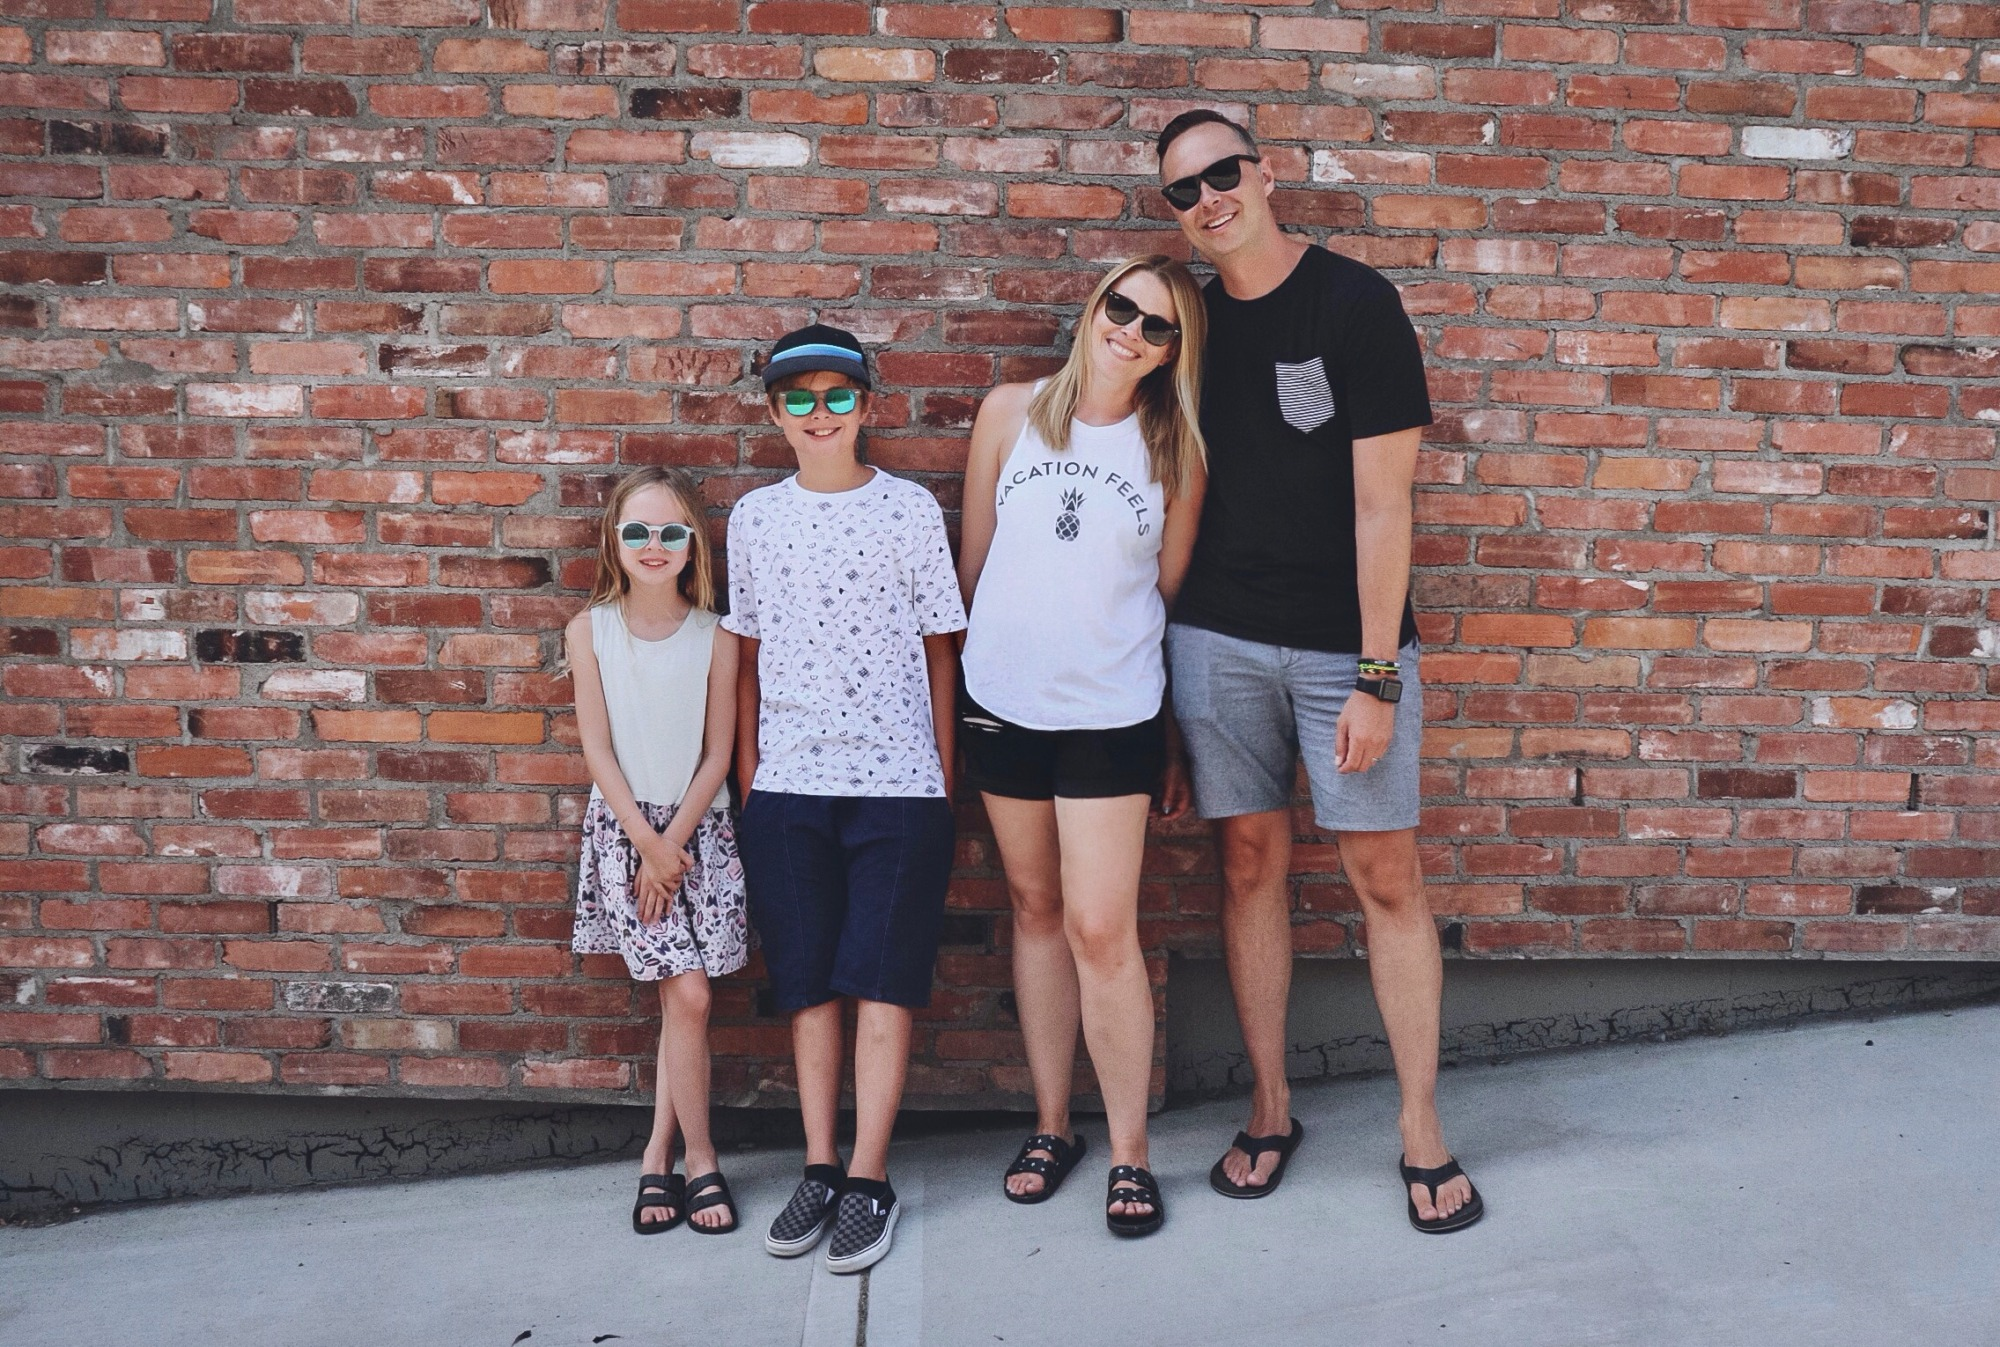 Summer Road Trip to Vernon